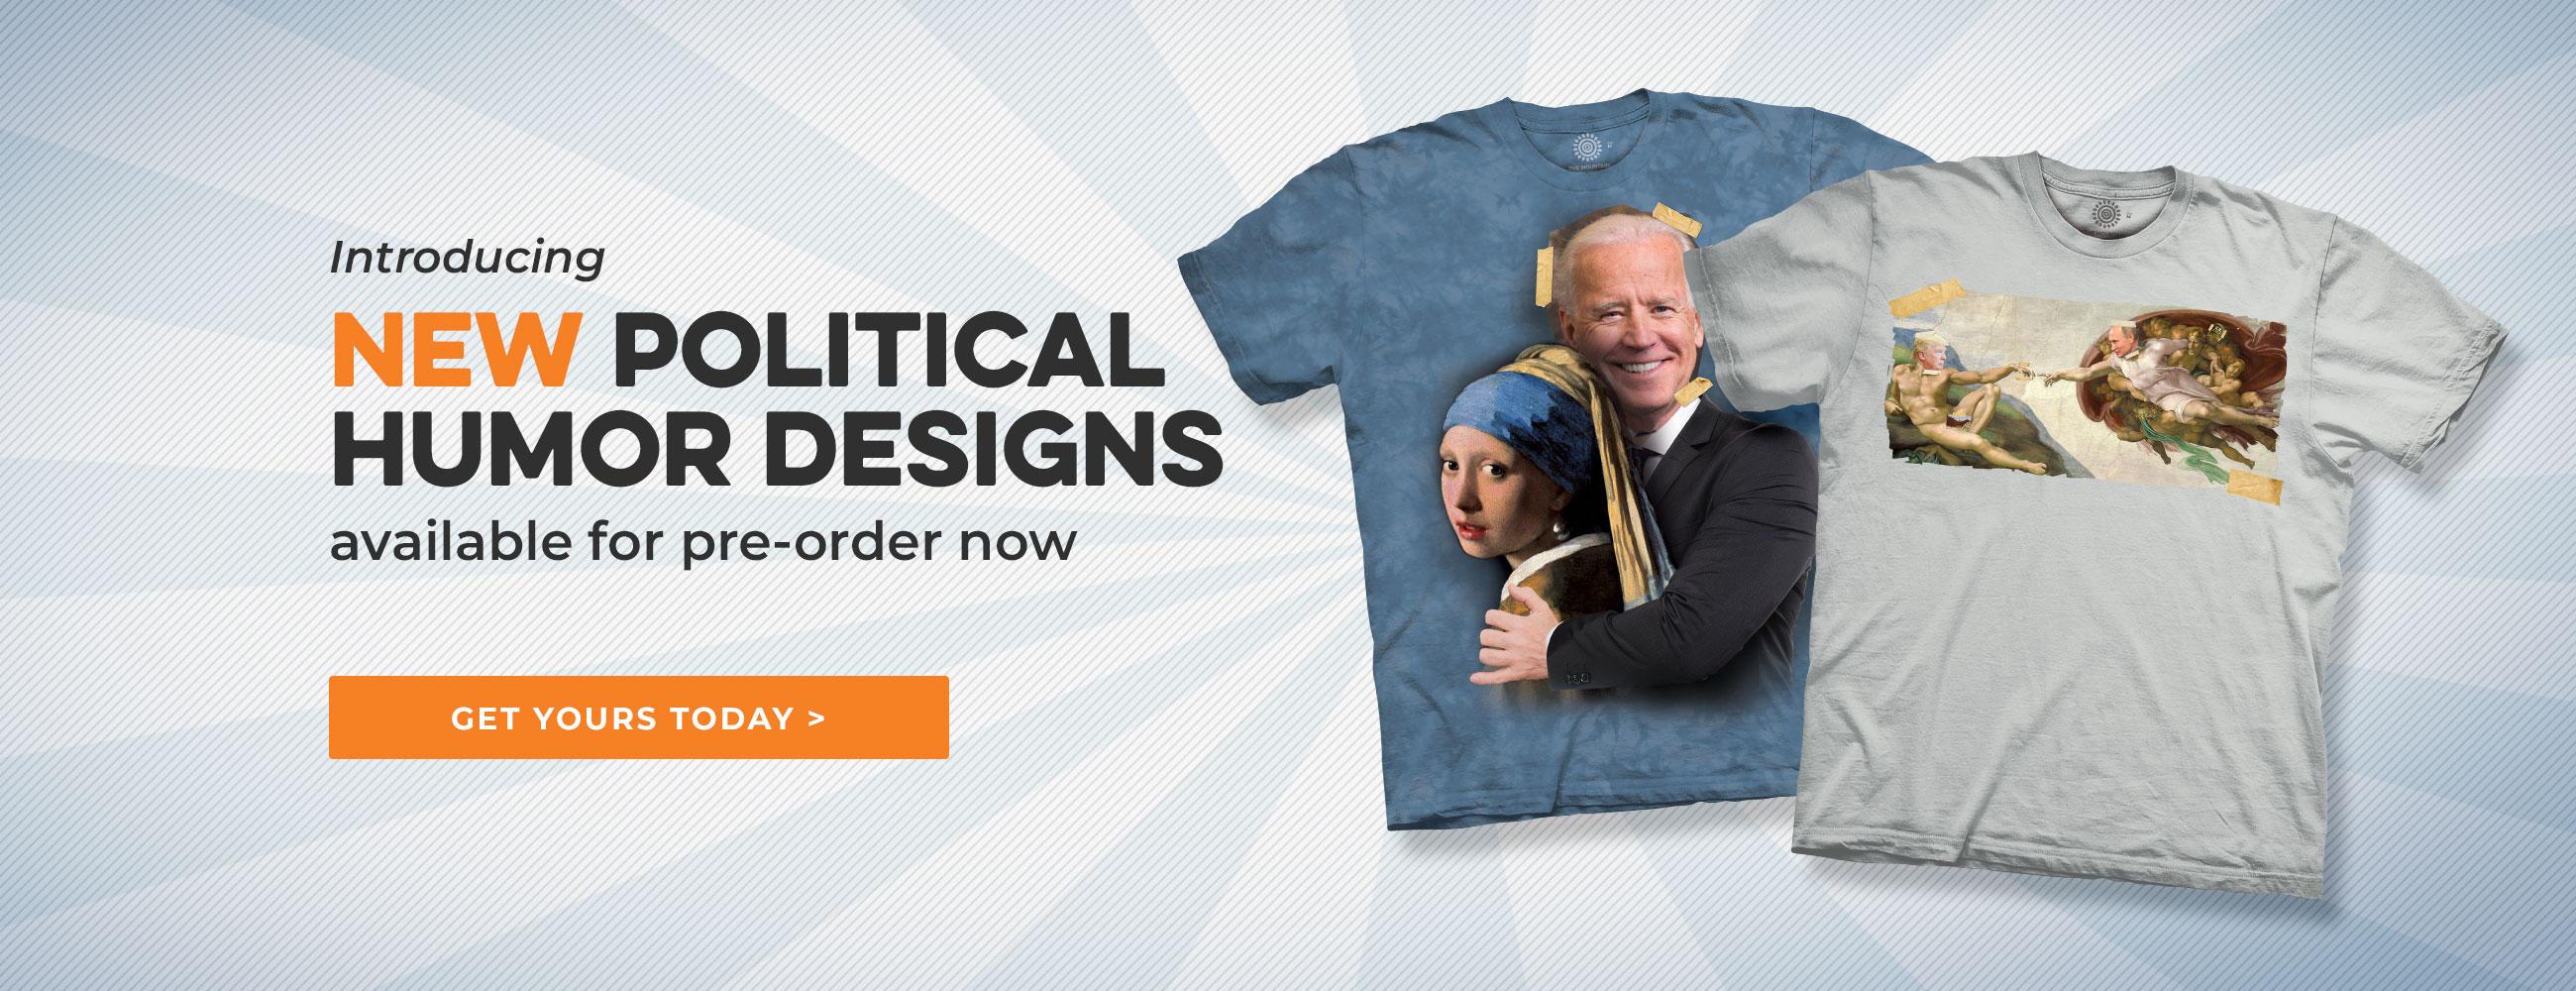 New Political Humor Designs